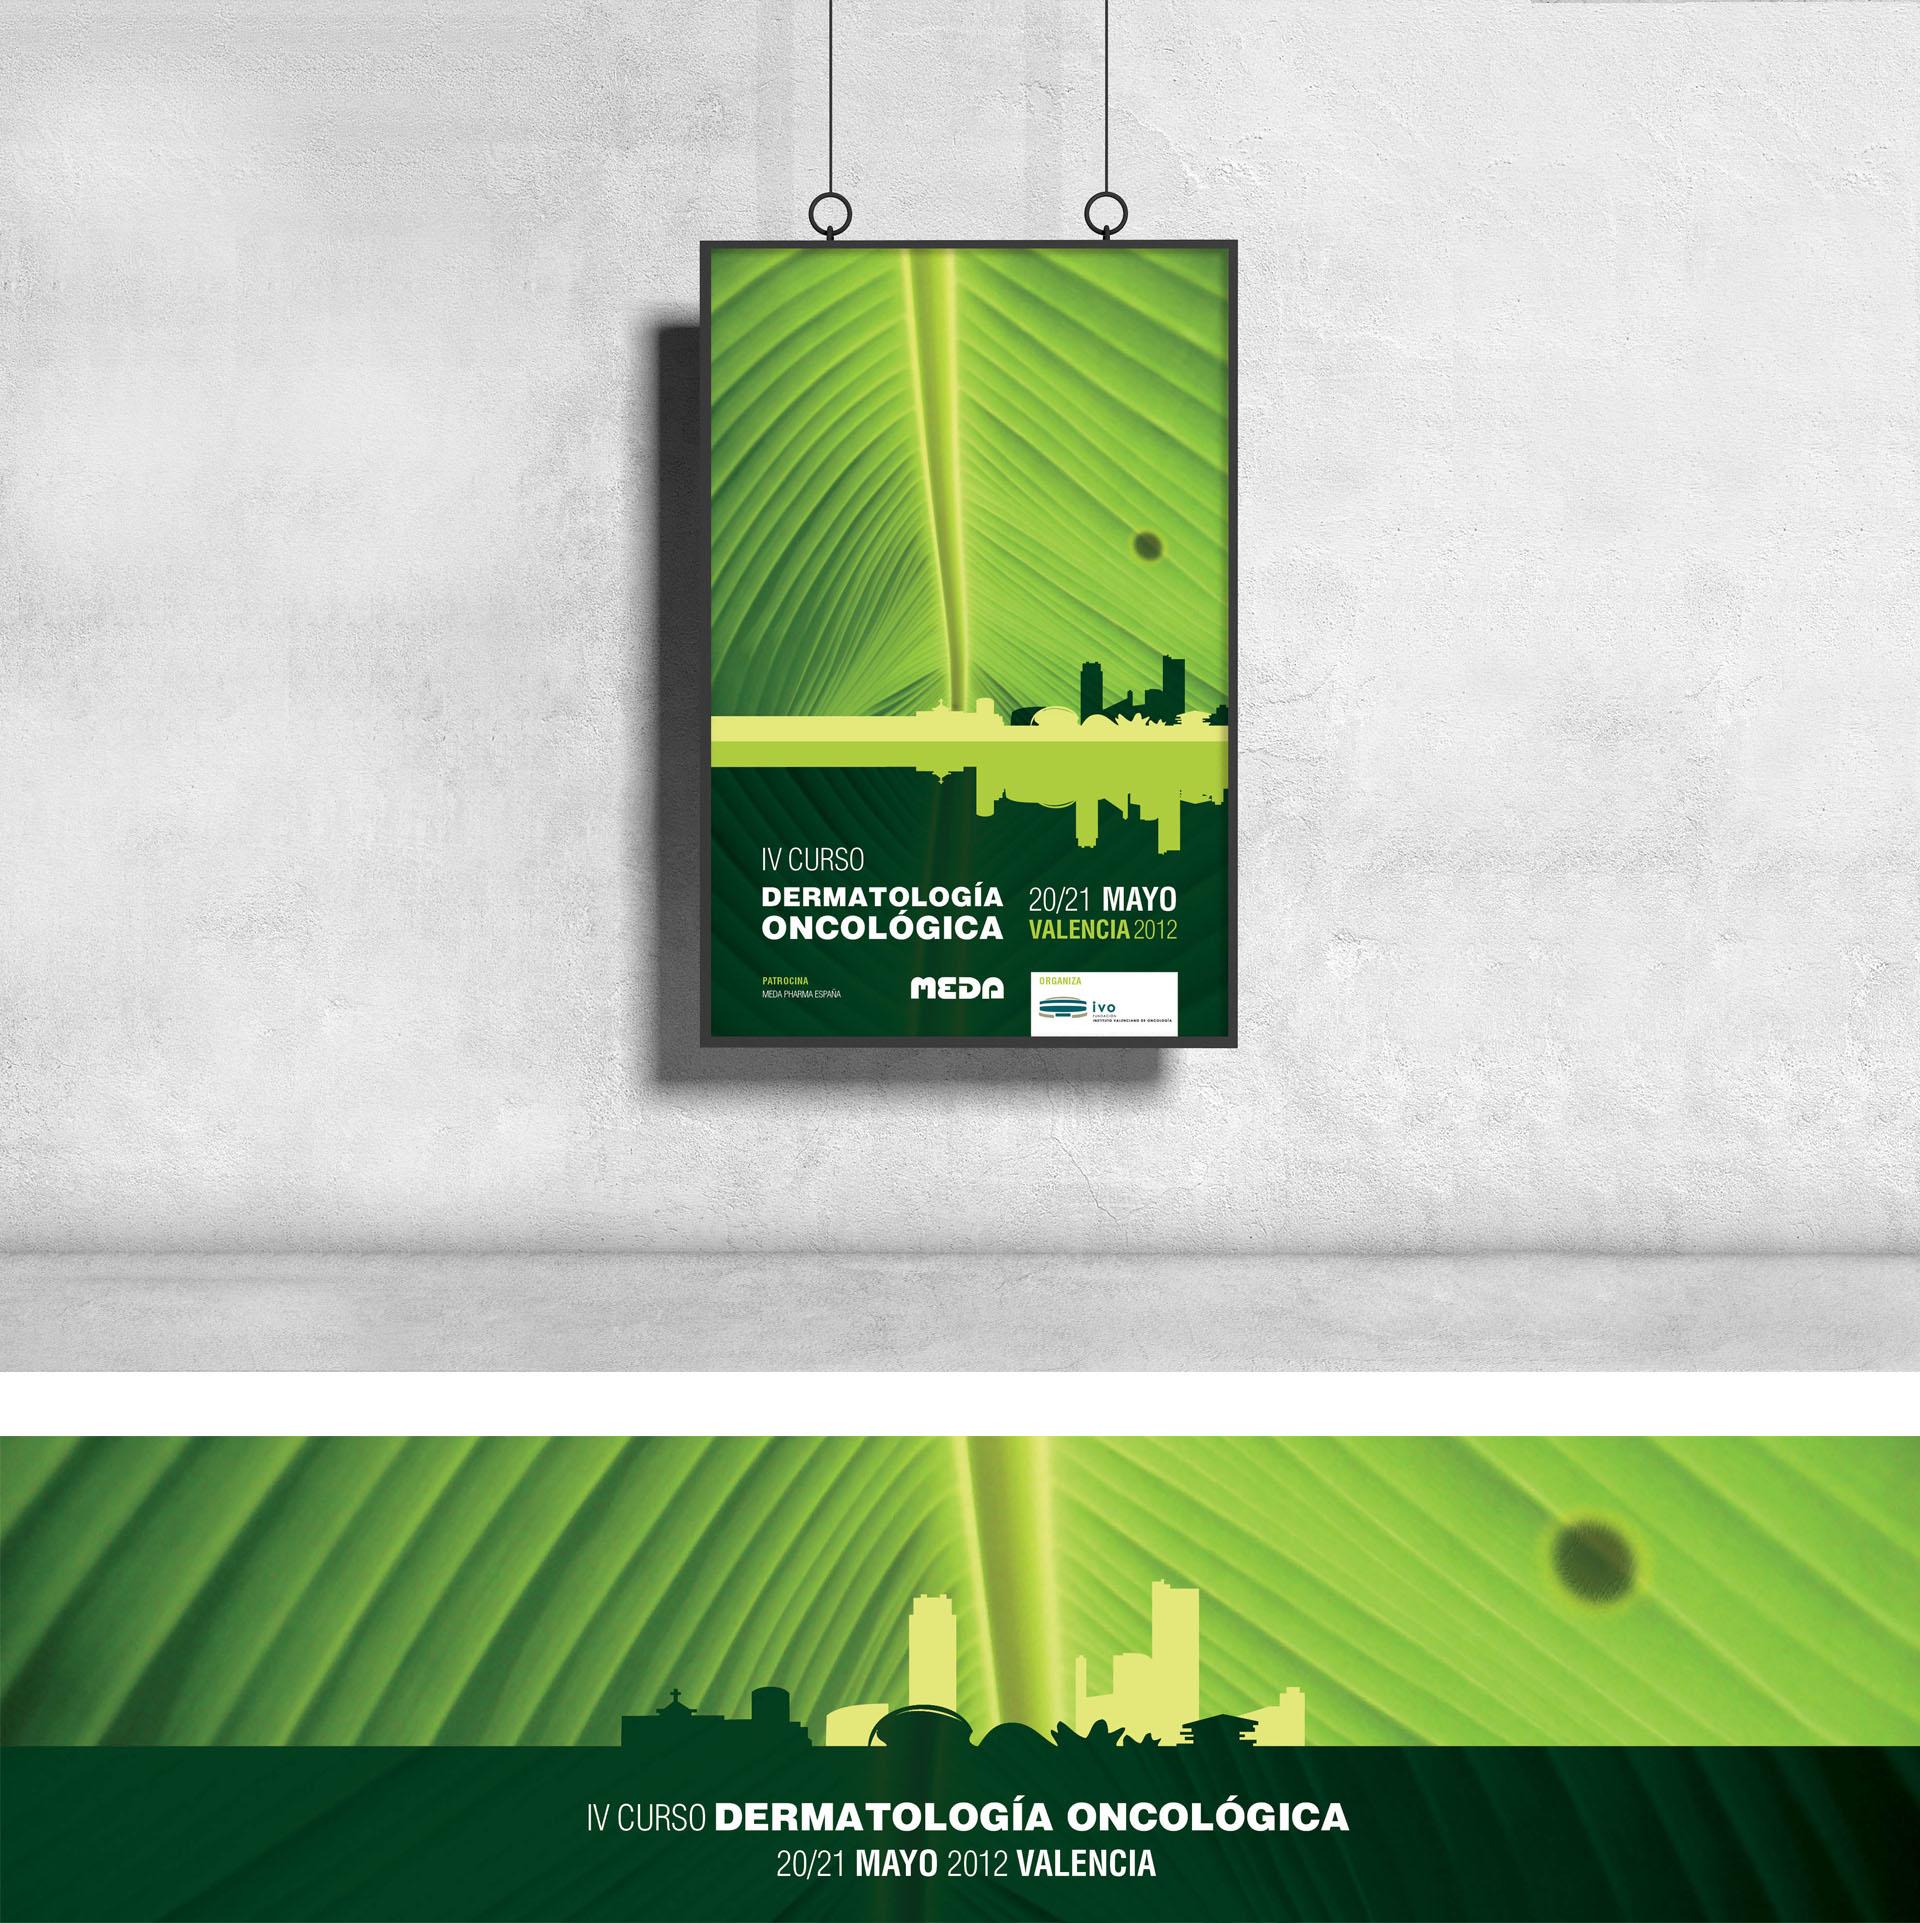 diseño corporativo cartel dermatologia oncologia susana cid